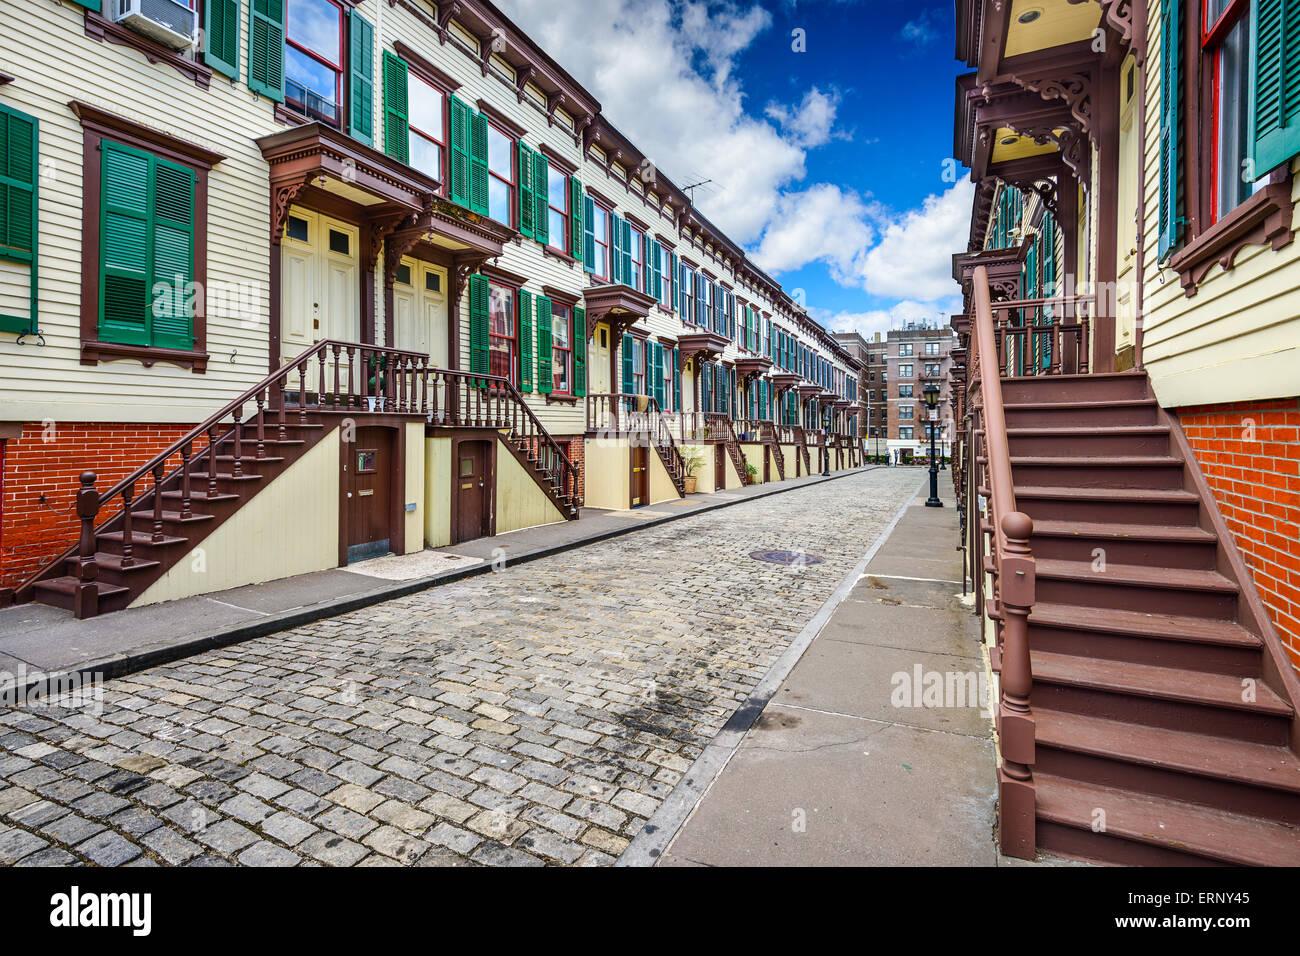 New York City, USA am Stadthäuser im Jumel Terrasse Historic District. Stockbild